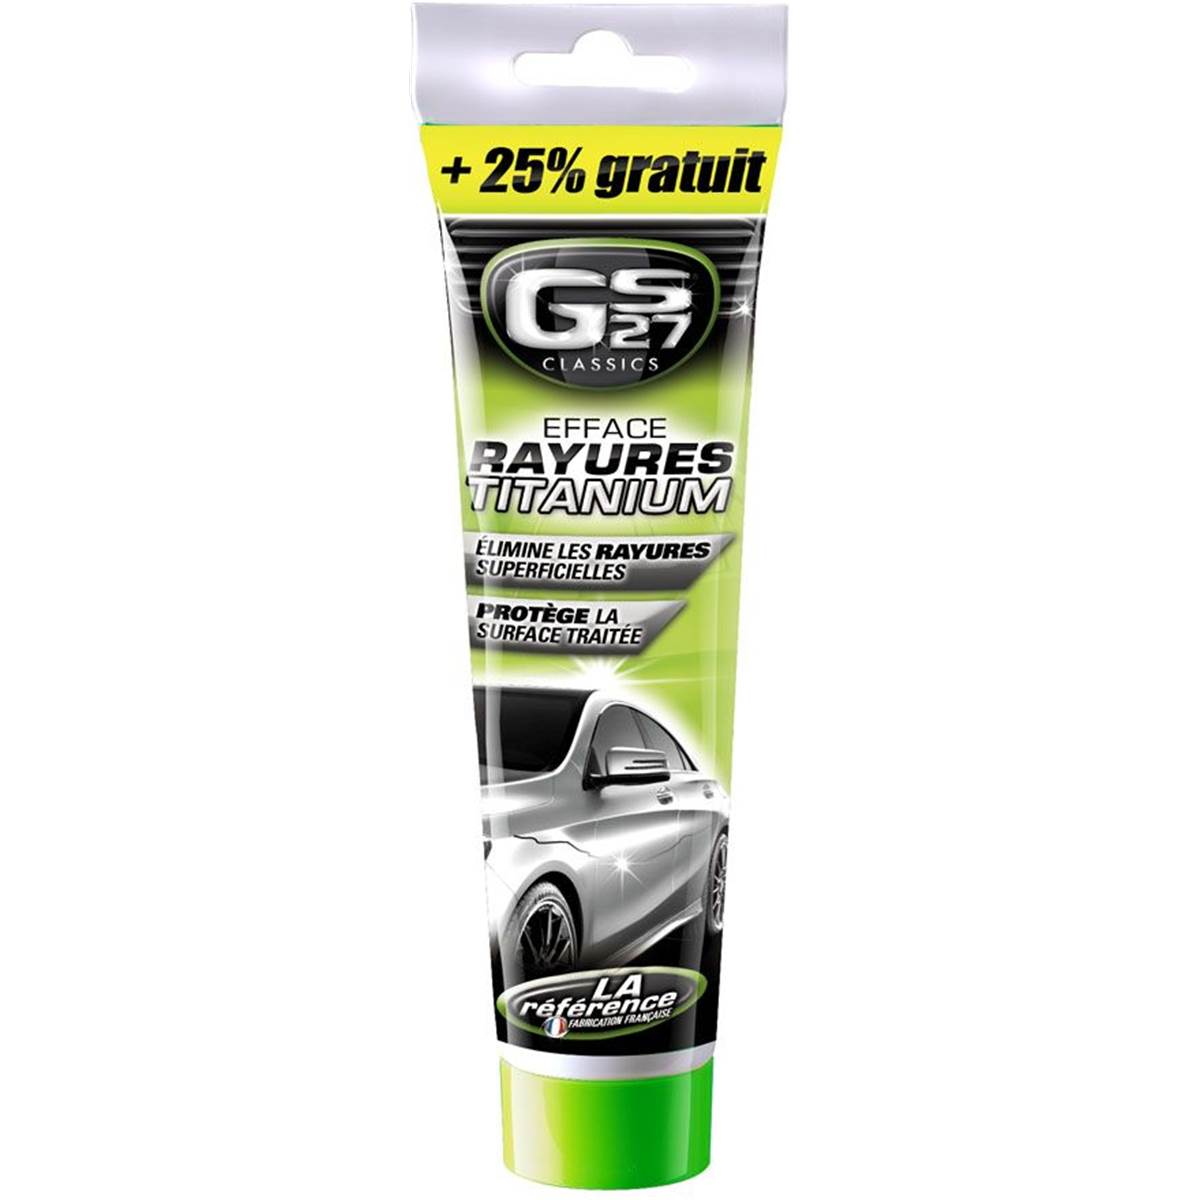 Efface rayures Titanium GS27 + 25% GRATUIT